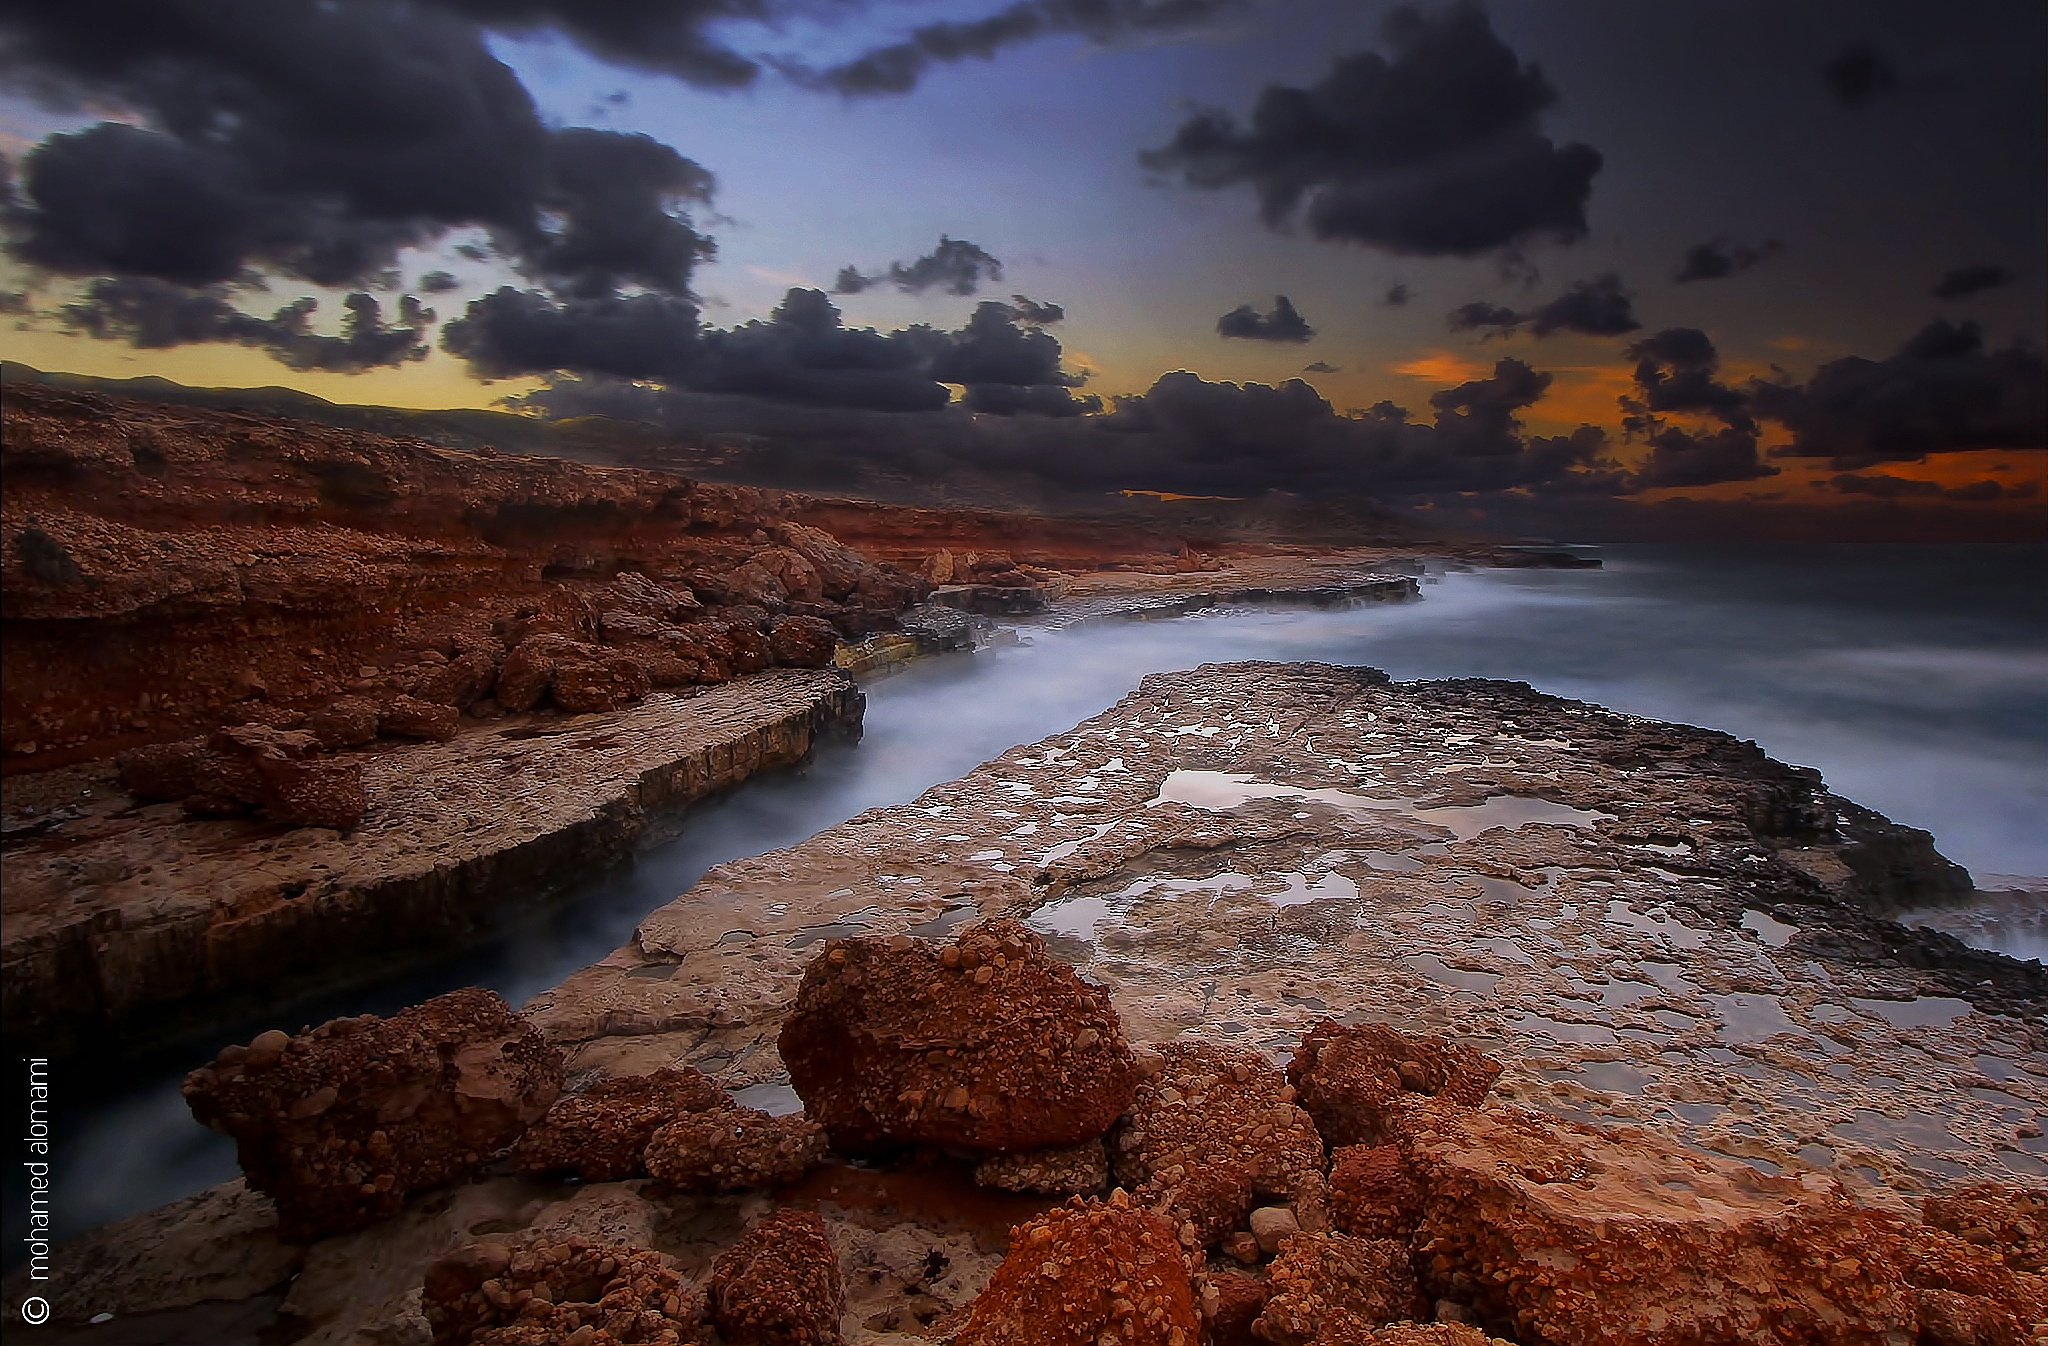 sunset_6 by mohamed alomami